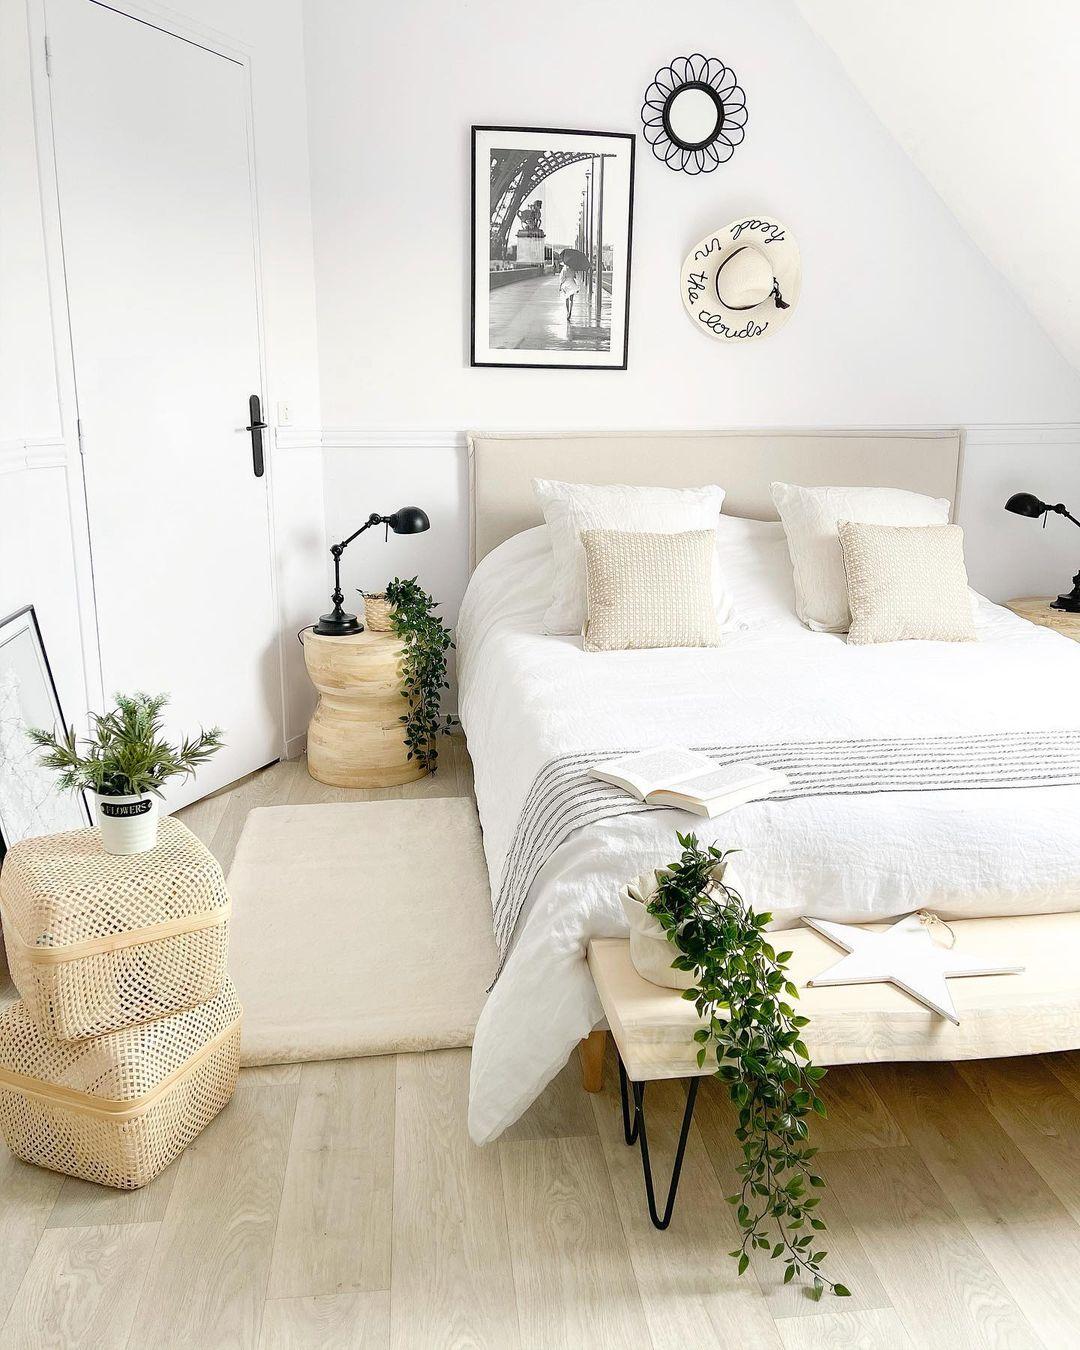 chambre style botanique blanche beige plante